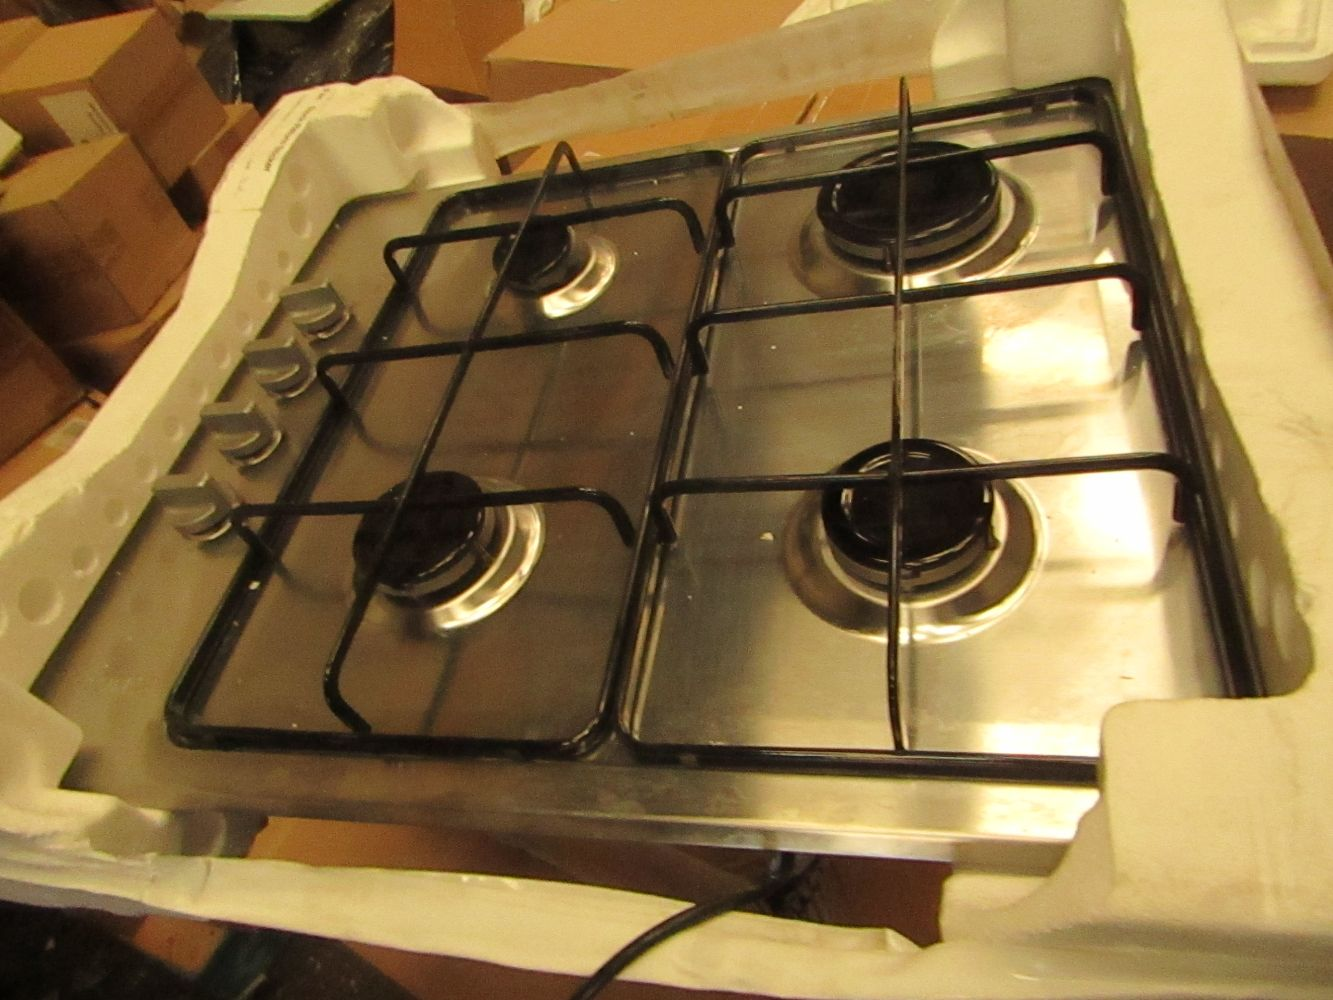 Fridges, Dishwashers, Ovens Extractors and more